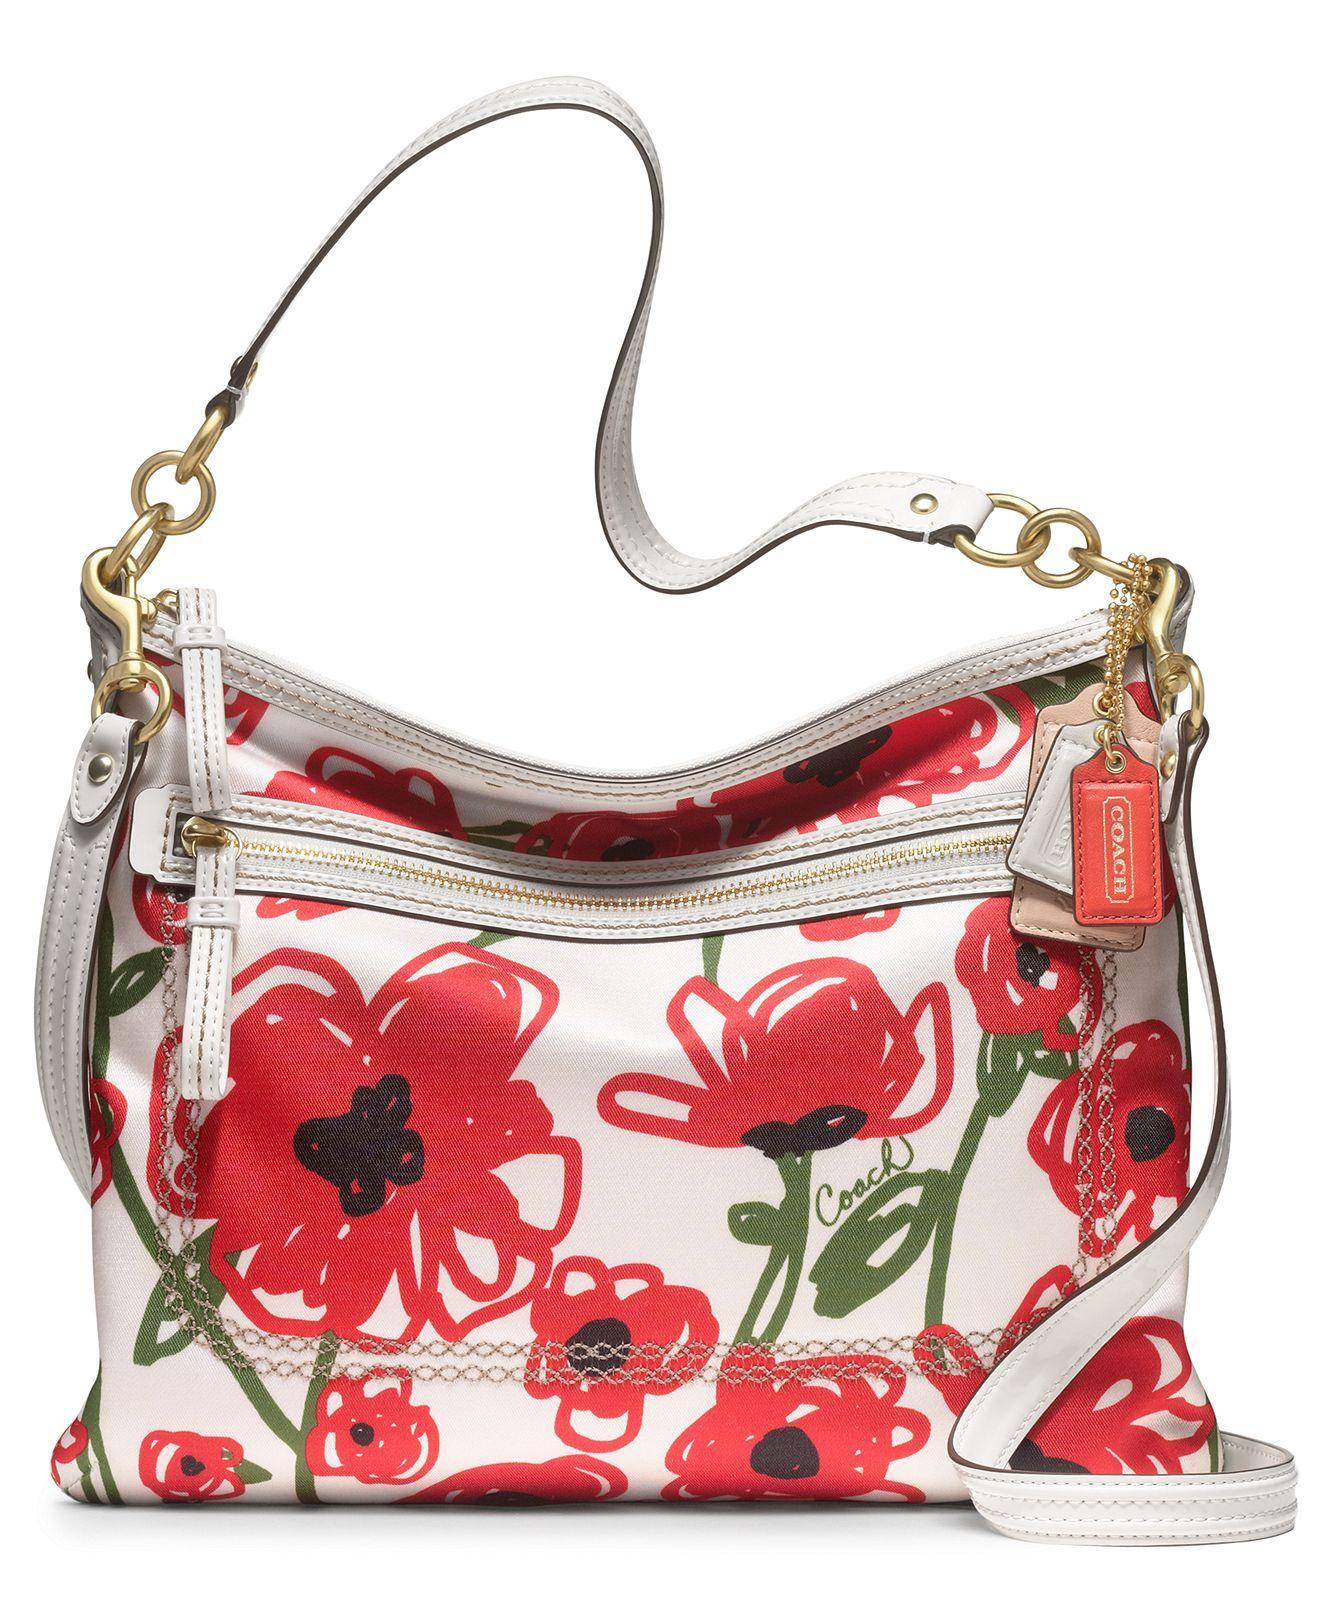 8c85825b8b COACH POPPY FLORAL PRINT PERRI HIPPIE - Shoulder Bags - Handbags    Accessories - Macy s